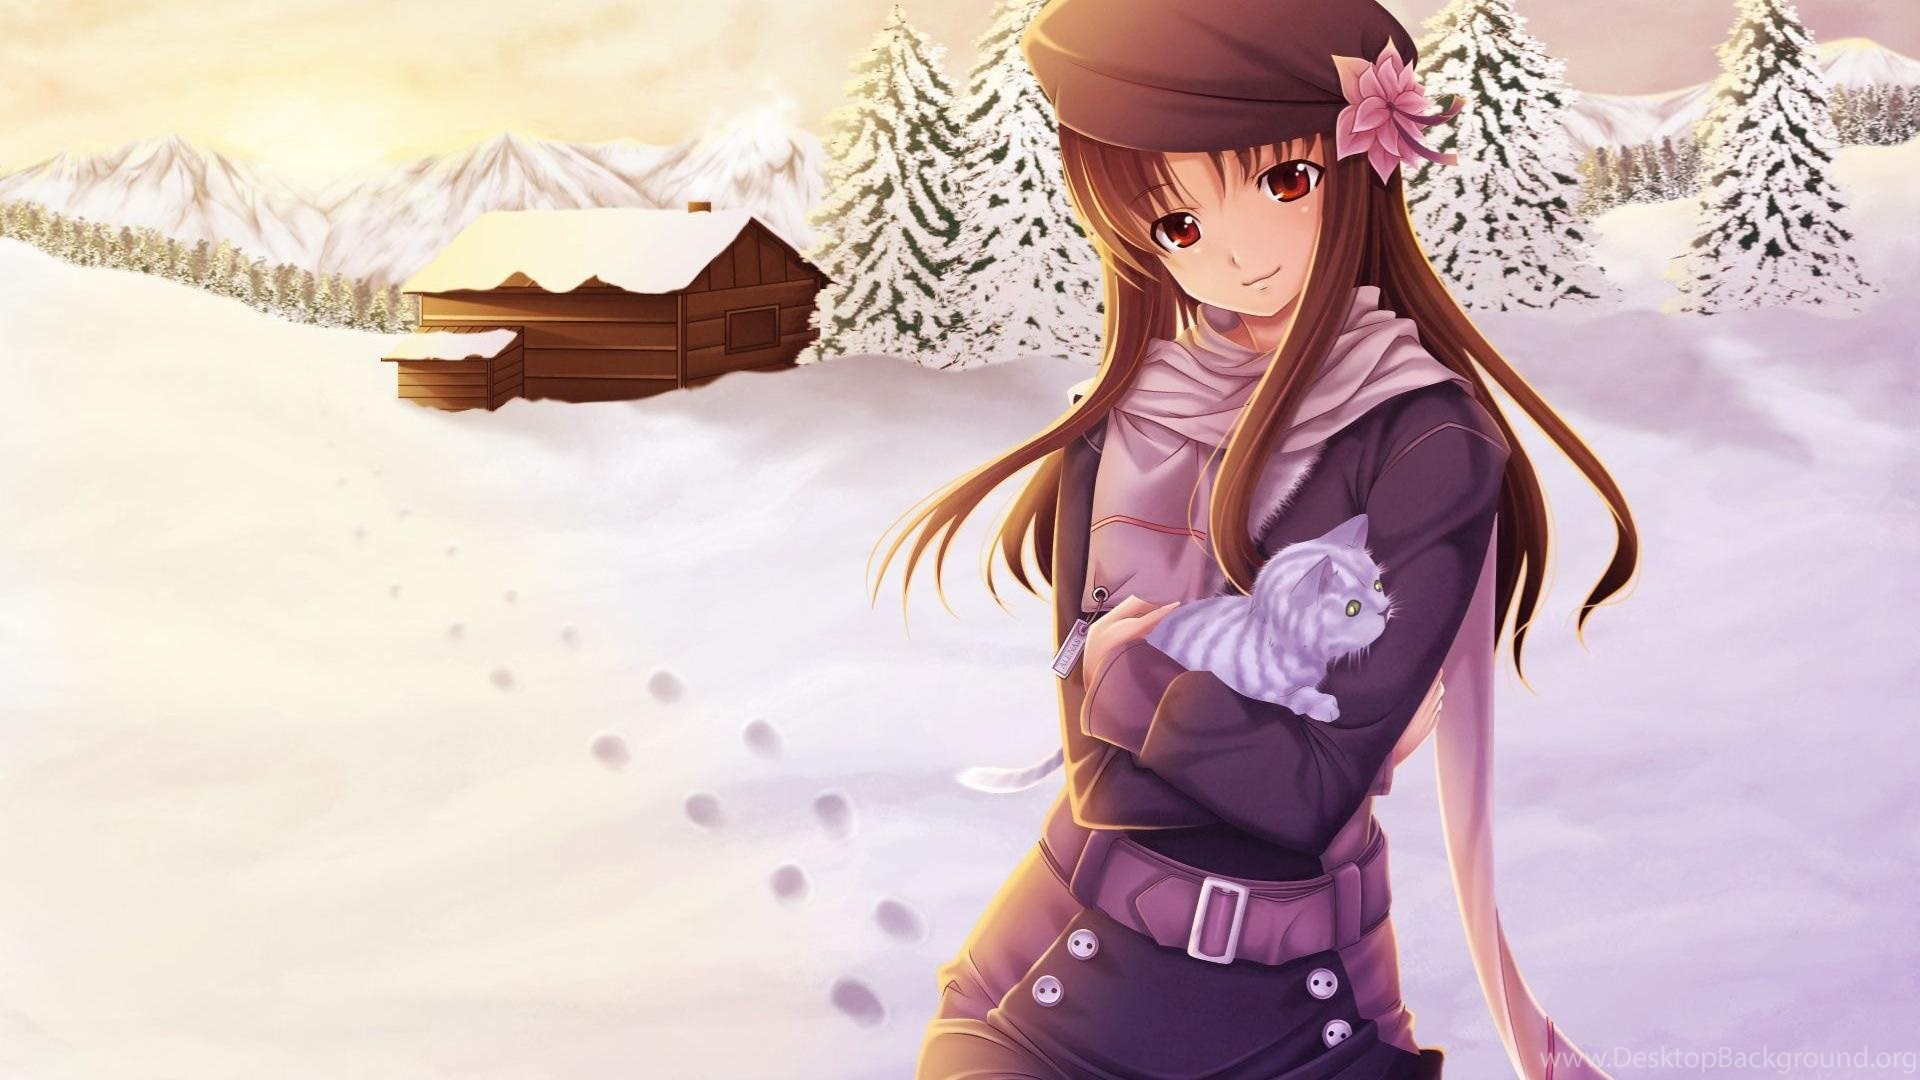 Wallpapers Korean Girl Anime Cute Sweet Winter Snow Hd 184012 8 Desktop Background